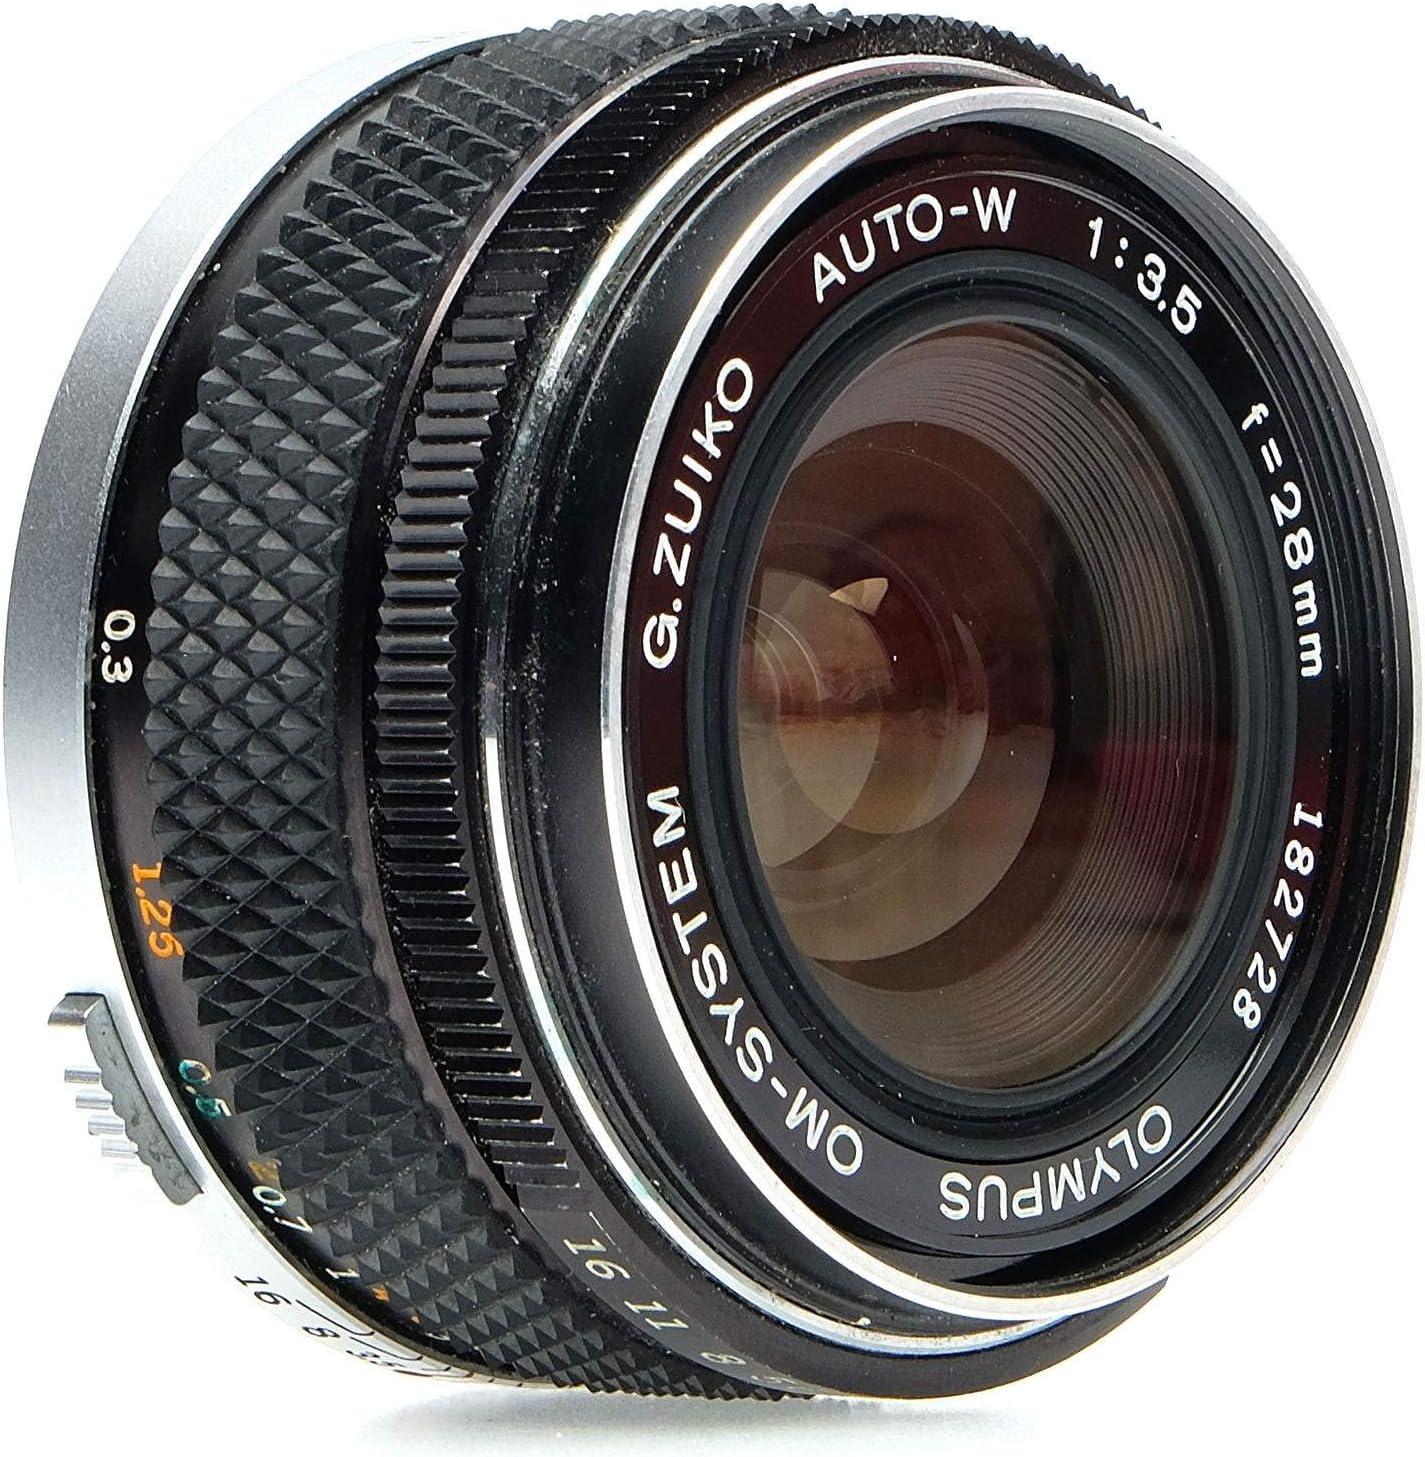 Olympus 28mm f//3.5 G.Zuiko Auto-W Manual Focus Wide Angle Lens for OM SLR Film Camera